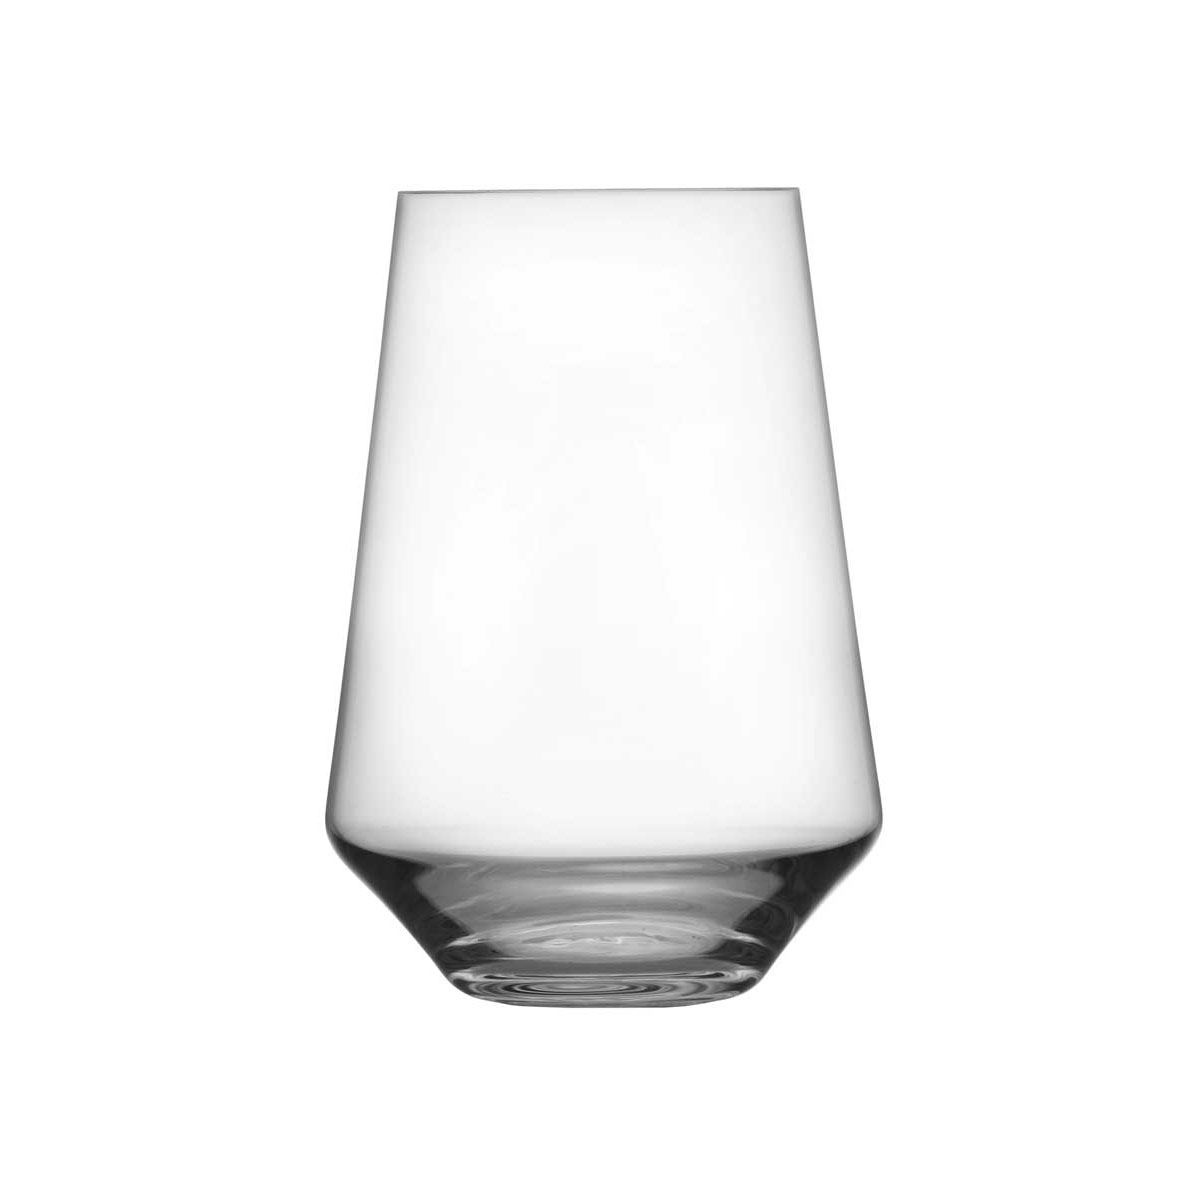 Schott Zwiesel Tritan Crystal, Pure Bordeaux, Cabernet Stemless Wine Tumbler, Single